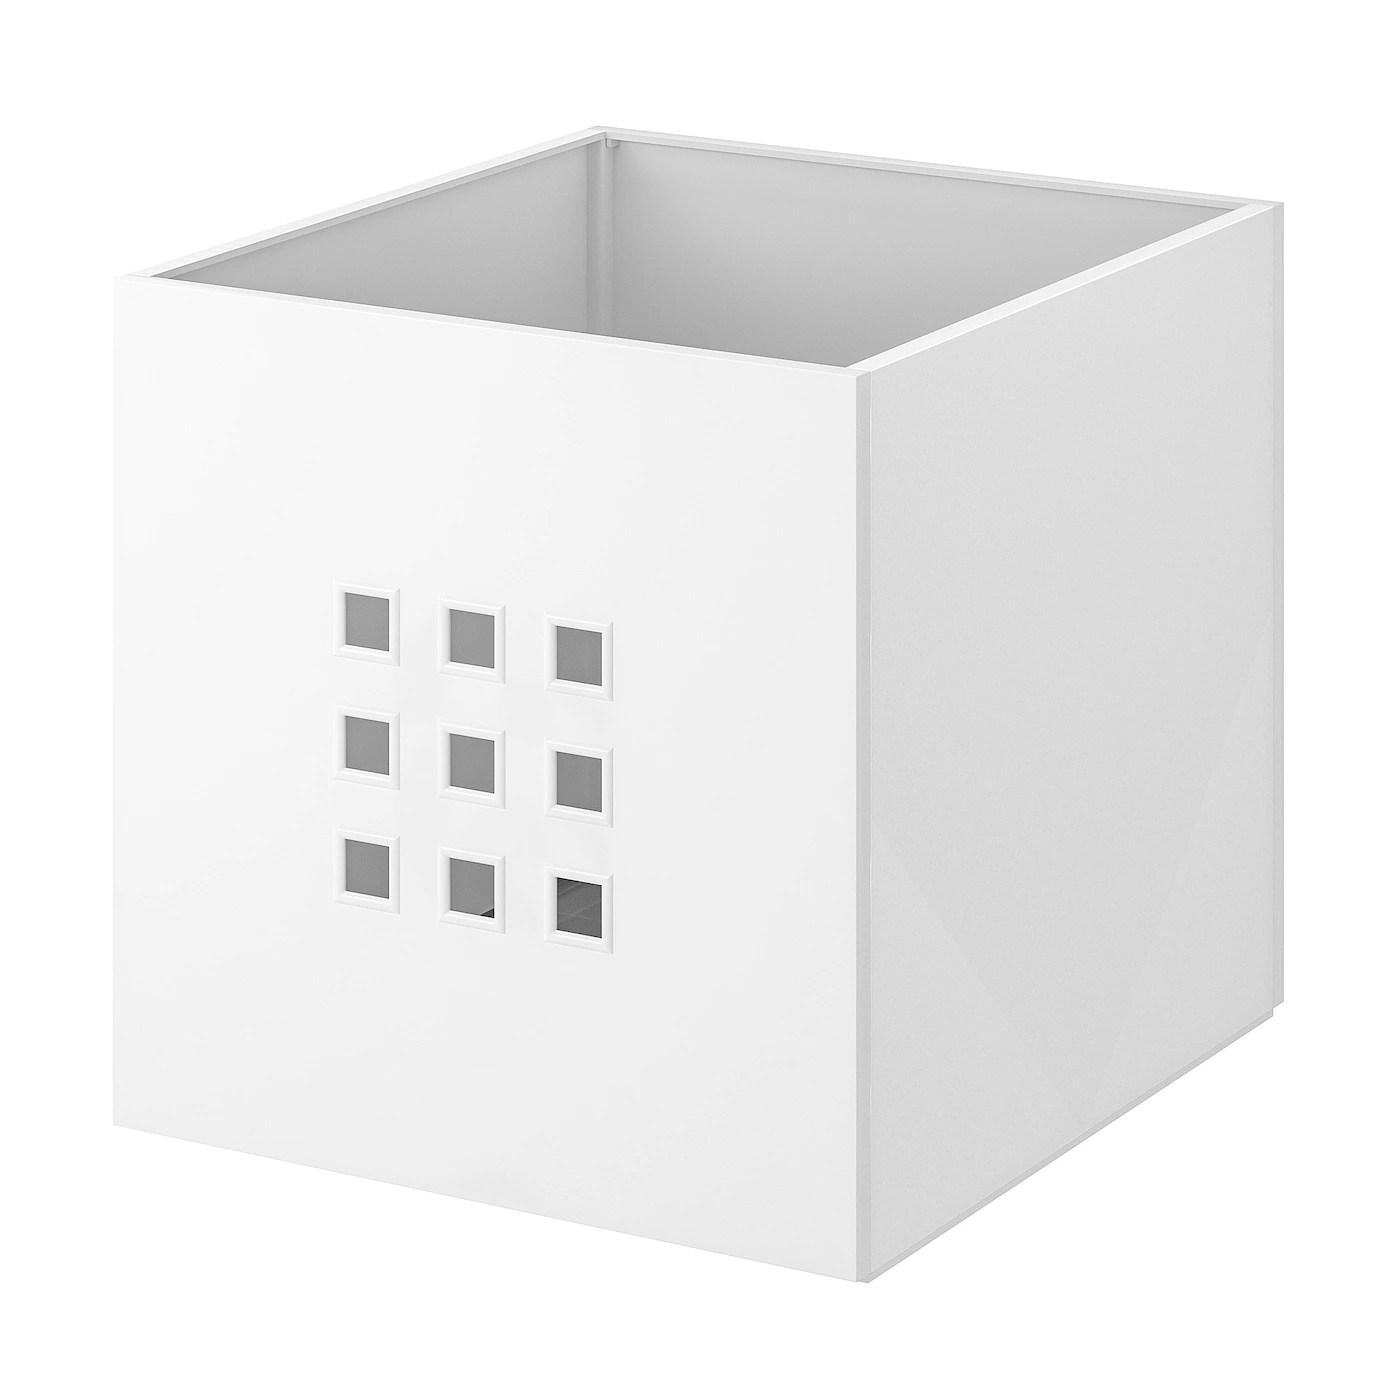 Lekman Boite Blanc 33x37x33 Cm Ikea